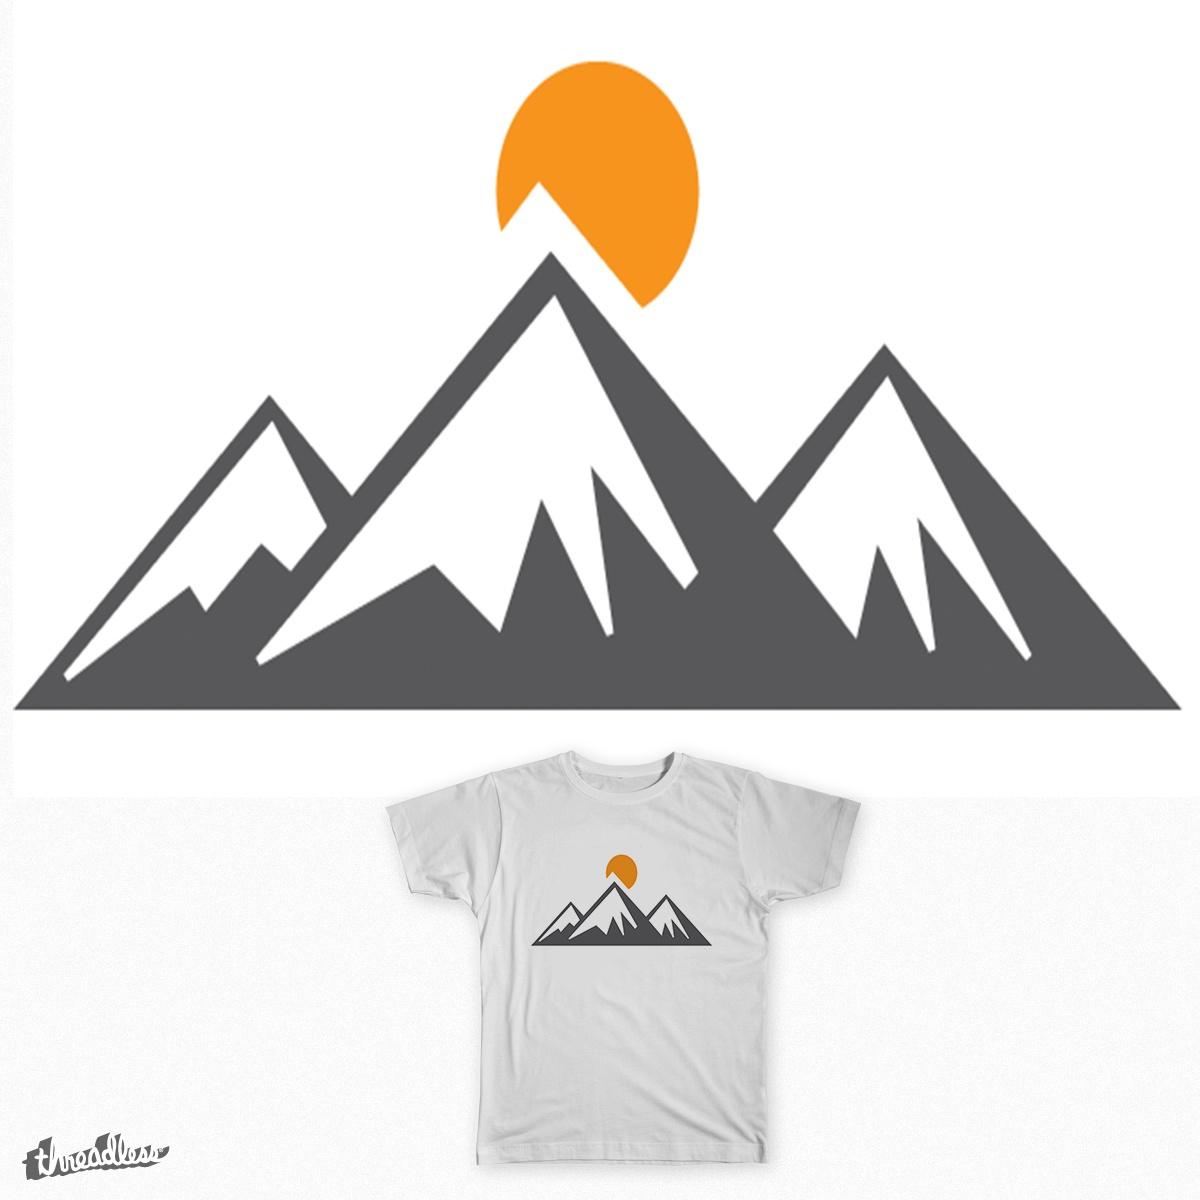 Mountain by Gentjunkie on Threadless